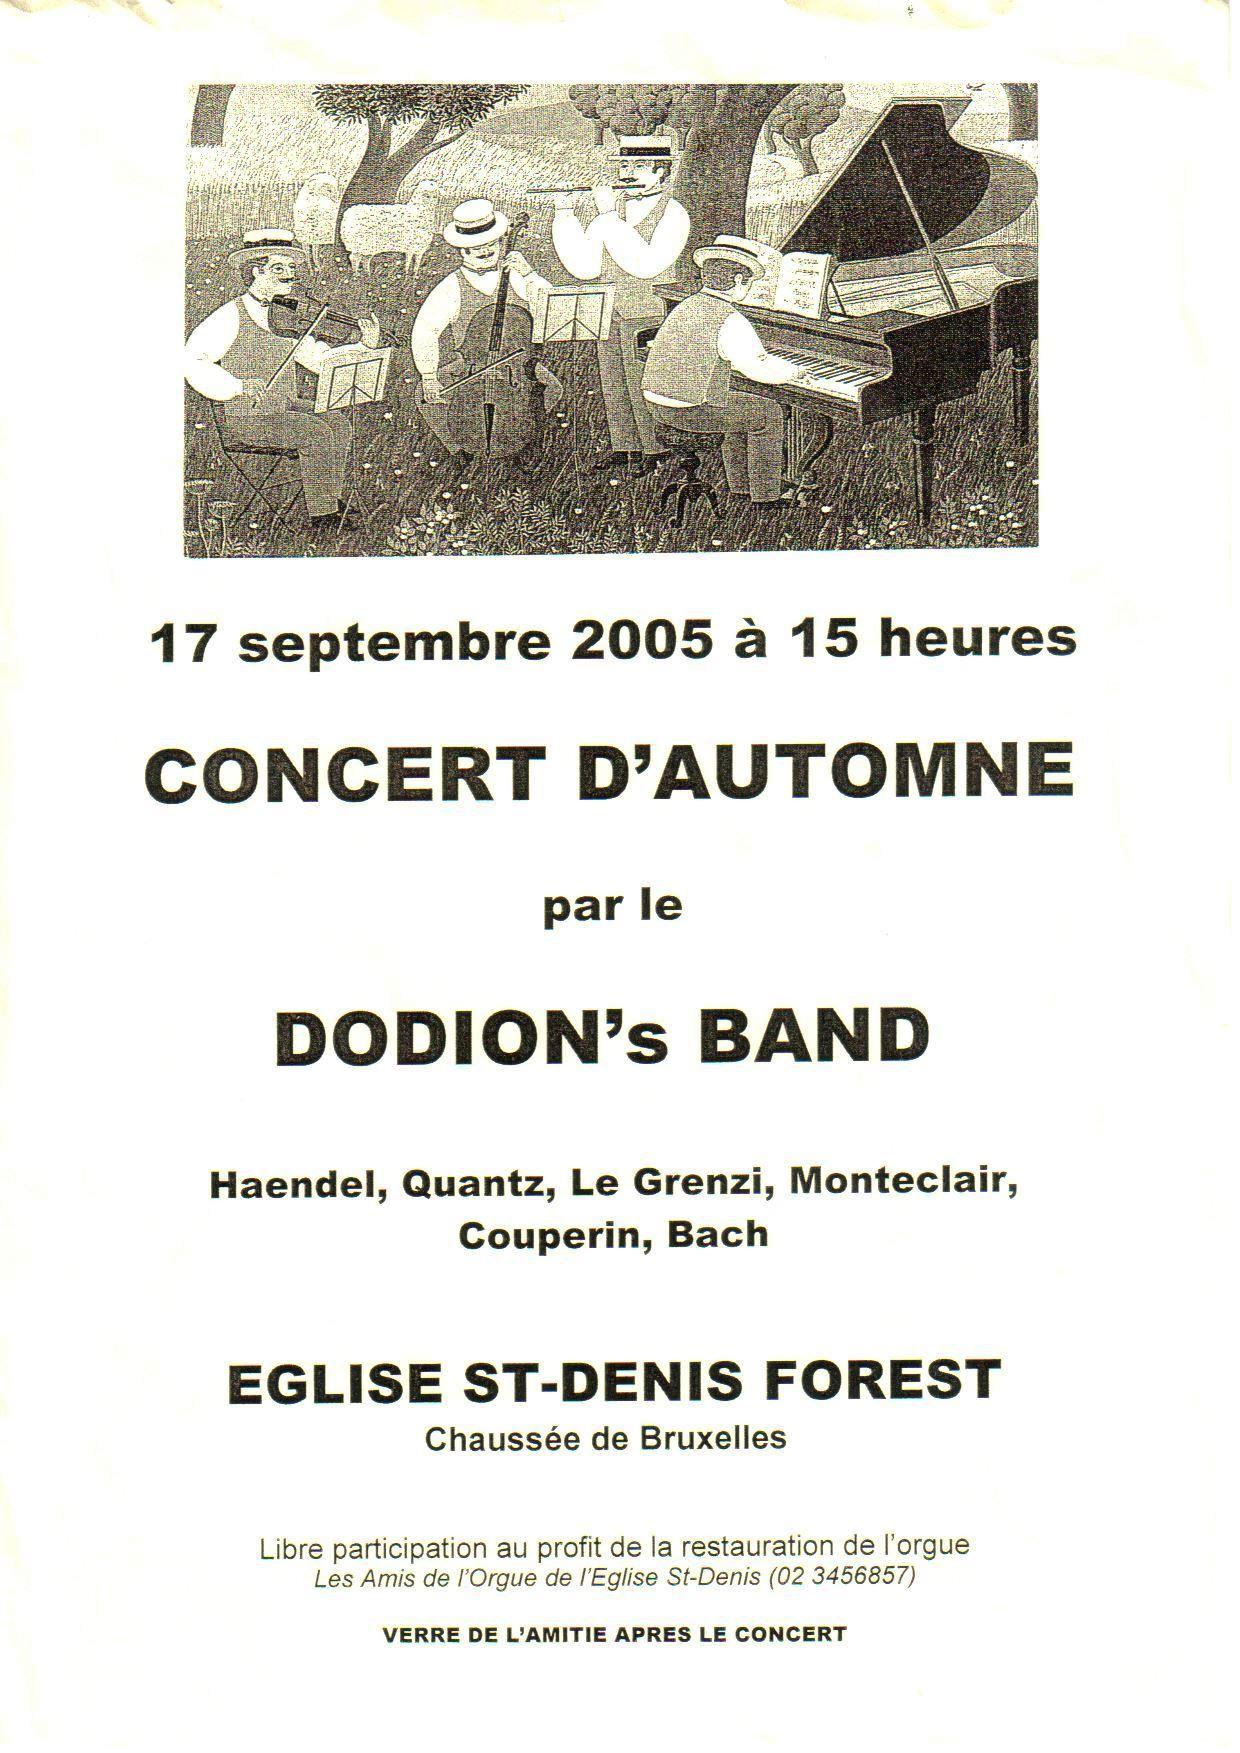 2005 9-17